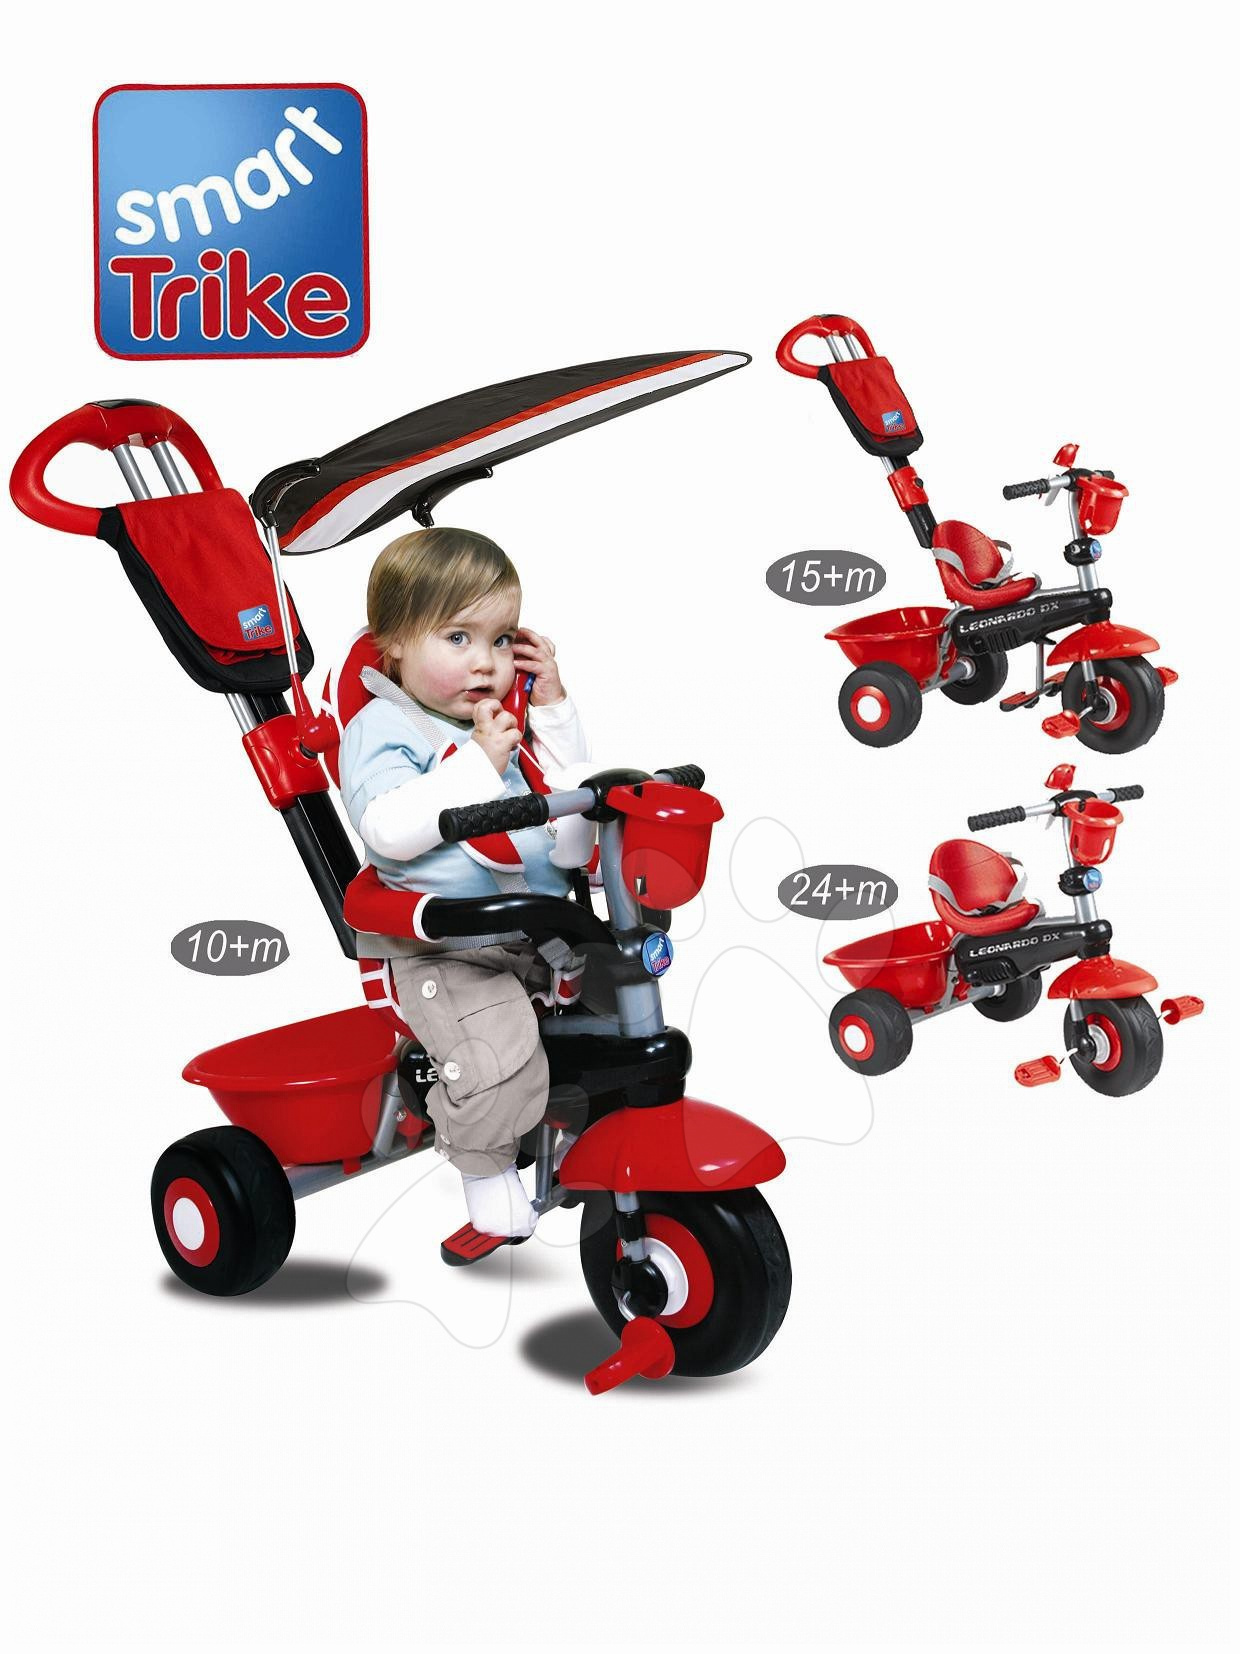 Triciklik 10 hónapos kortól - Tricikli pedálos Leonardo Delux smarTrike piros – fekete